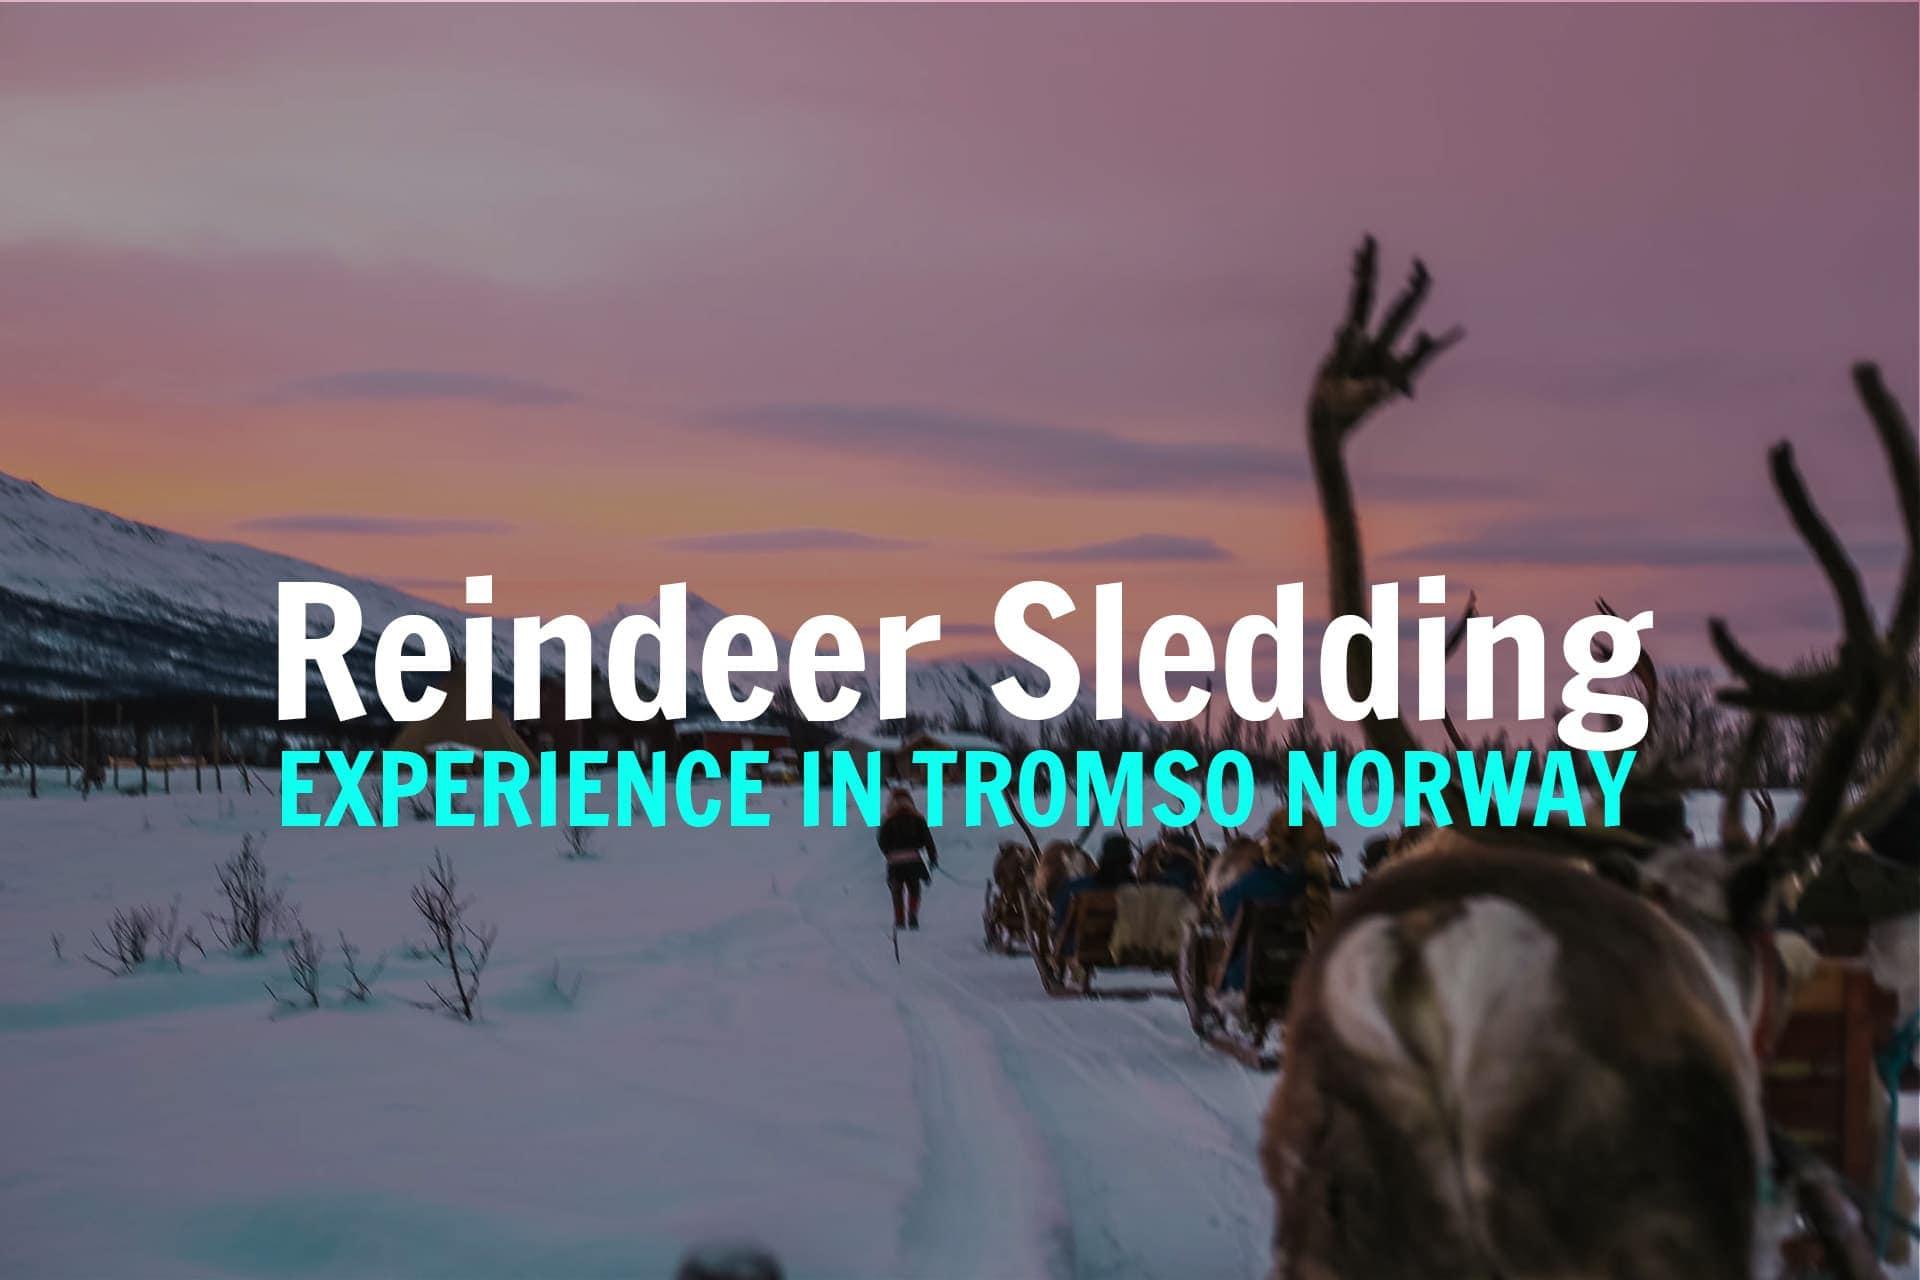 TROMSO-REINDEER-SLEDDING